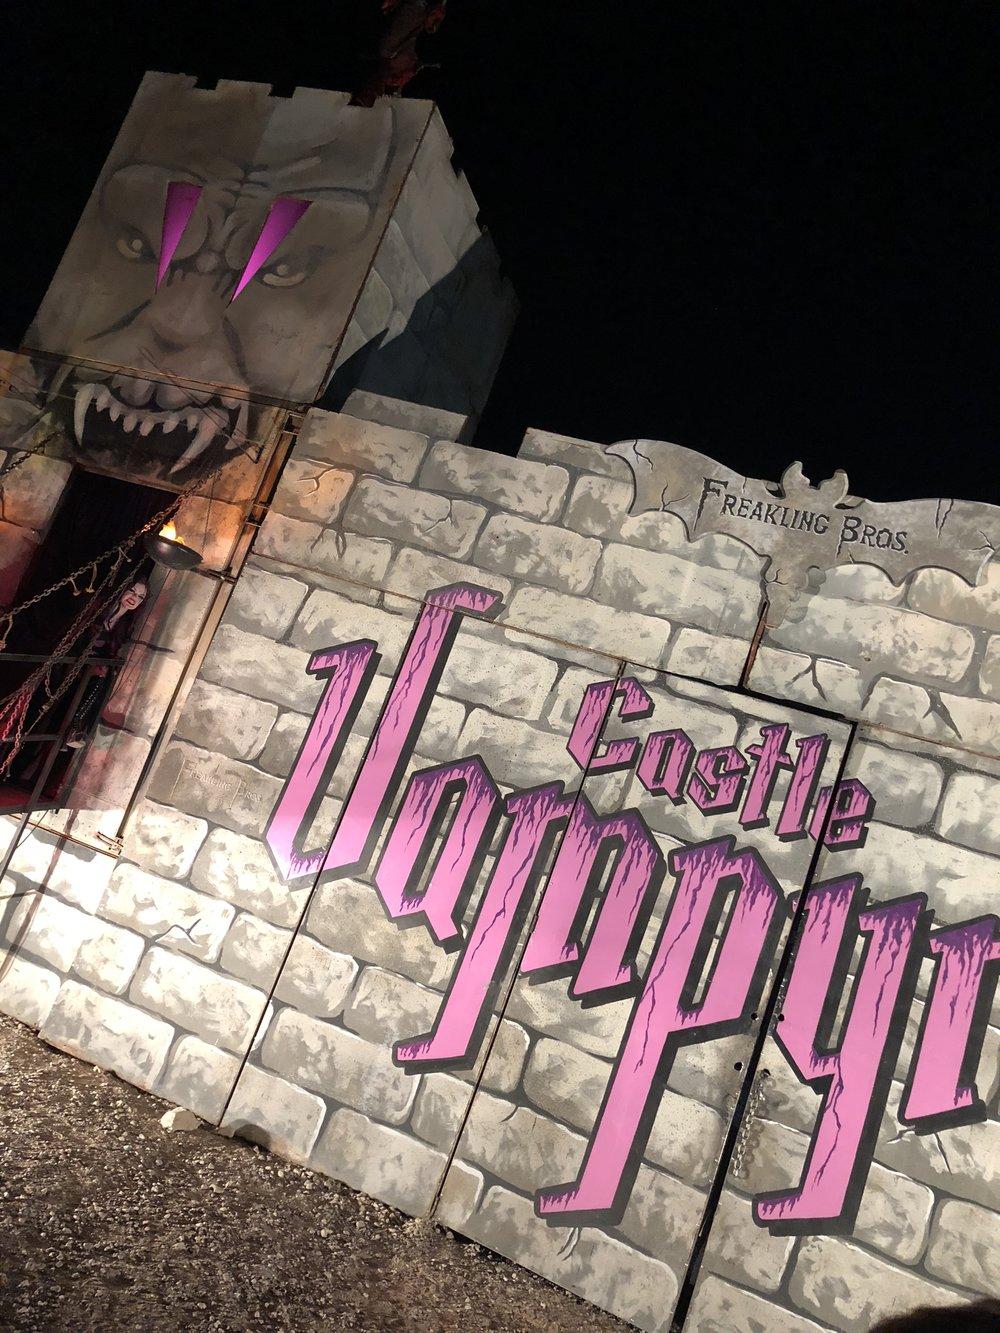 Freakling Bros. - Castle Vamypr